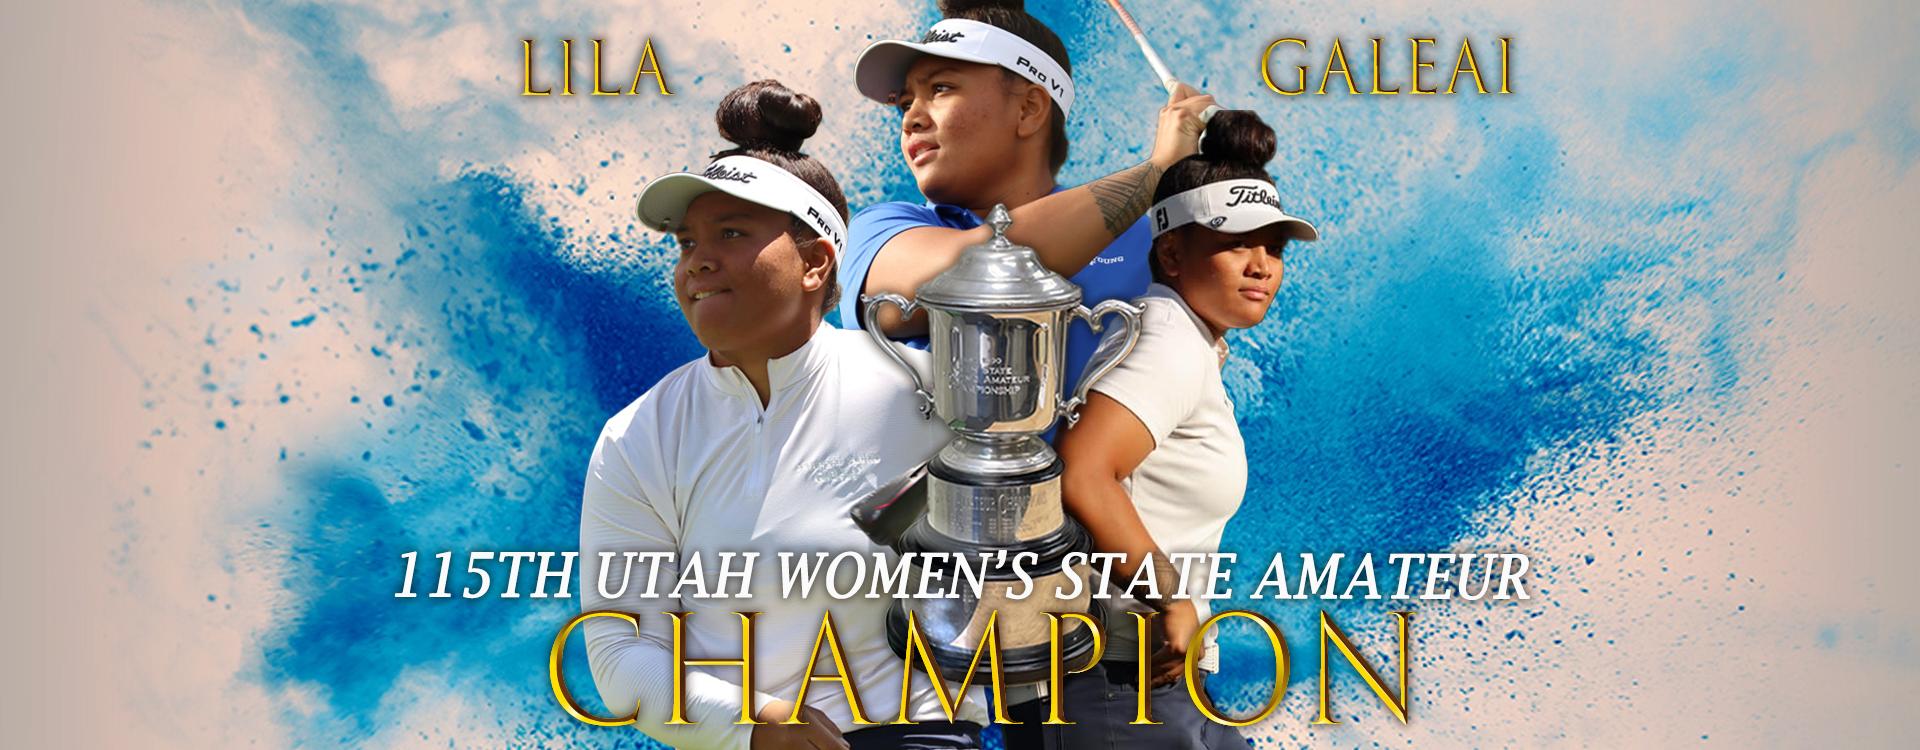 115th Utah Women's State Am Champion